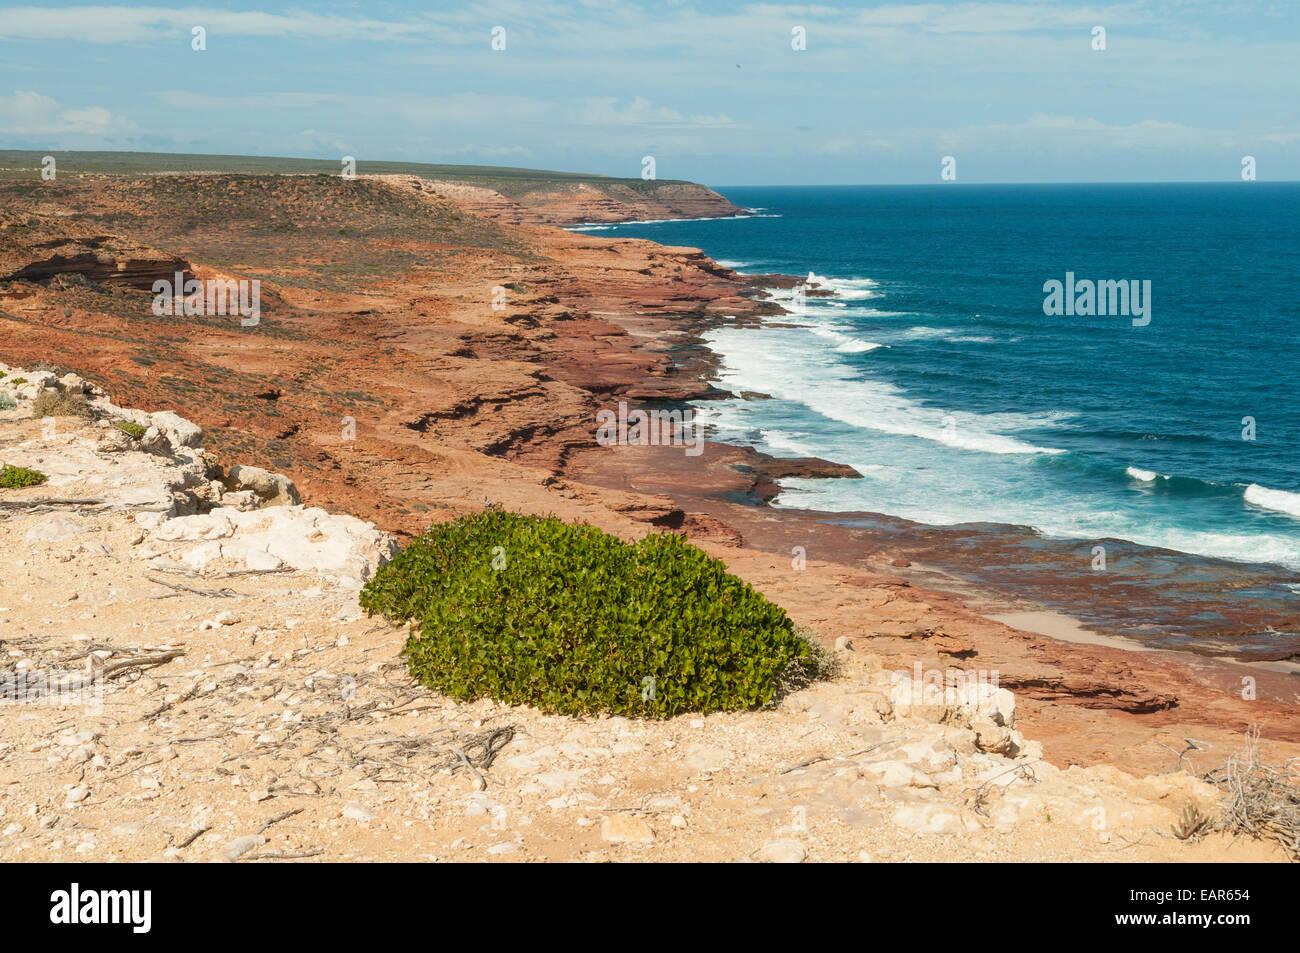 View South from Red Bluff, Kalbarri NP, WA, Australia - Stock Image